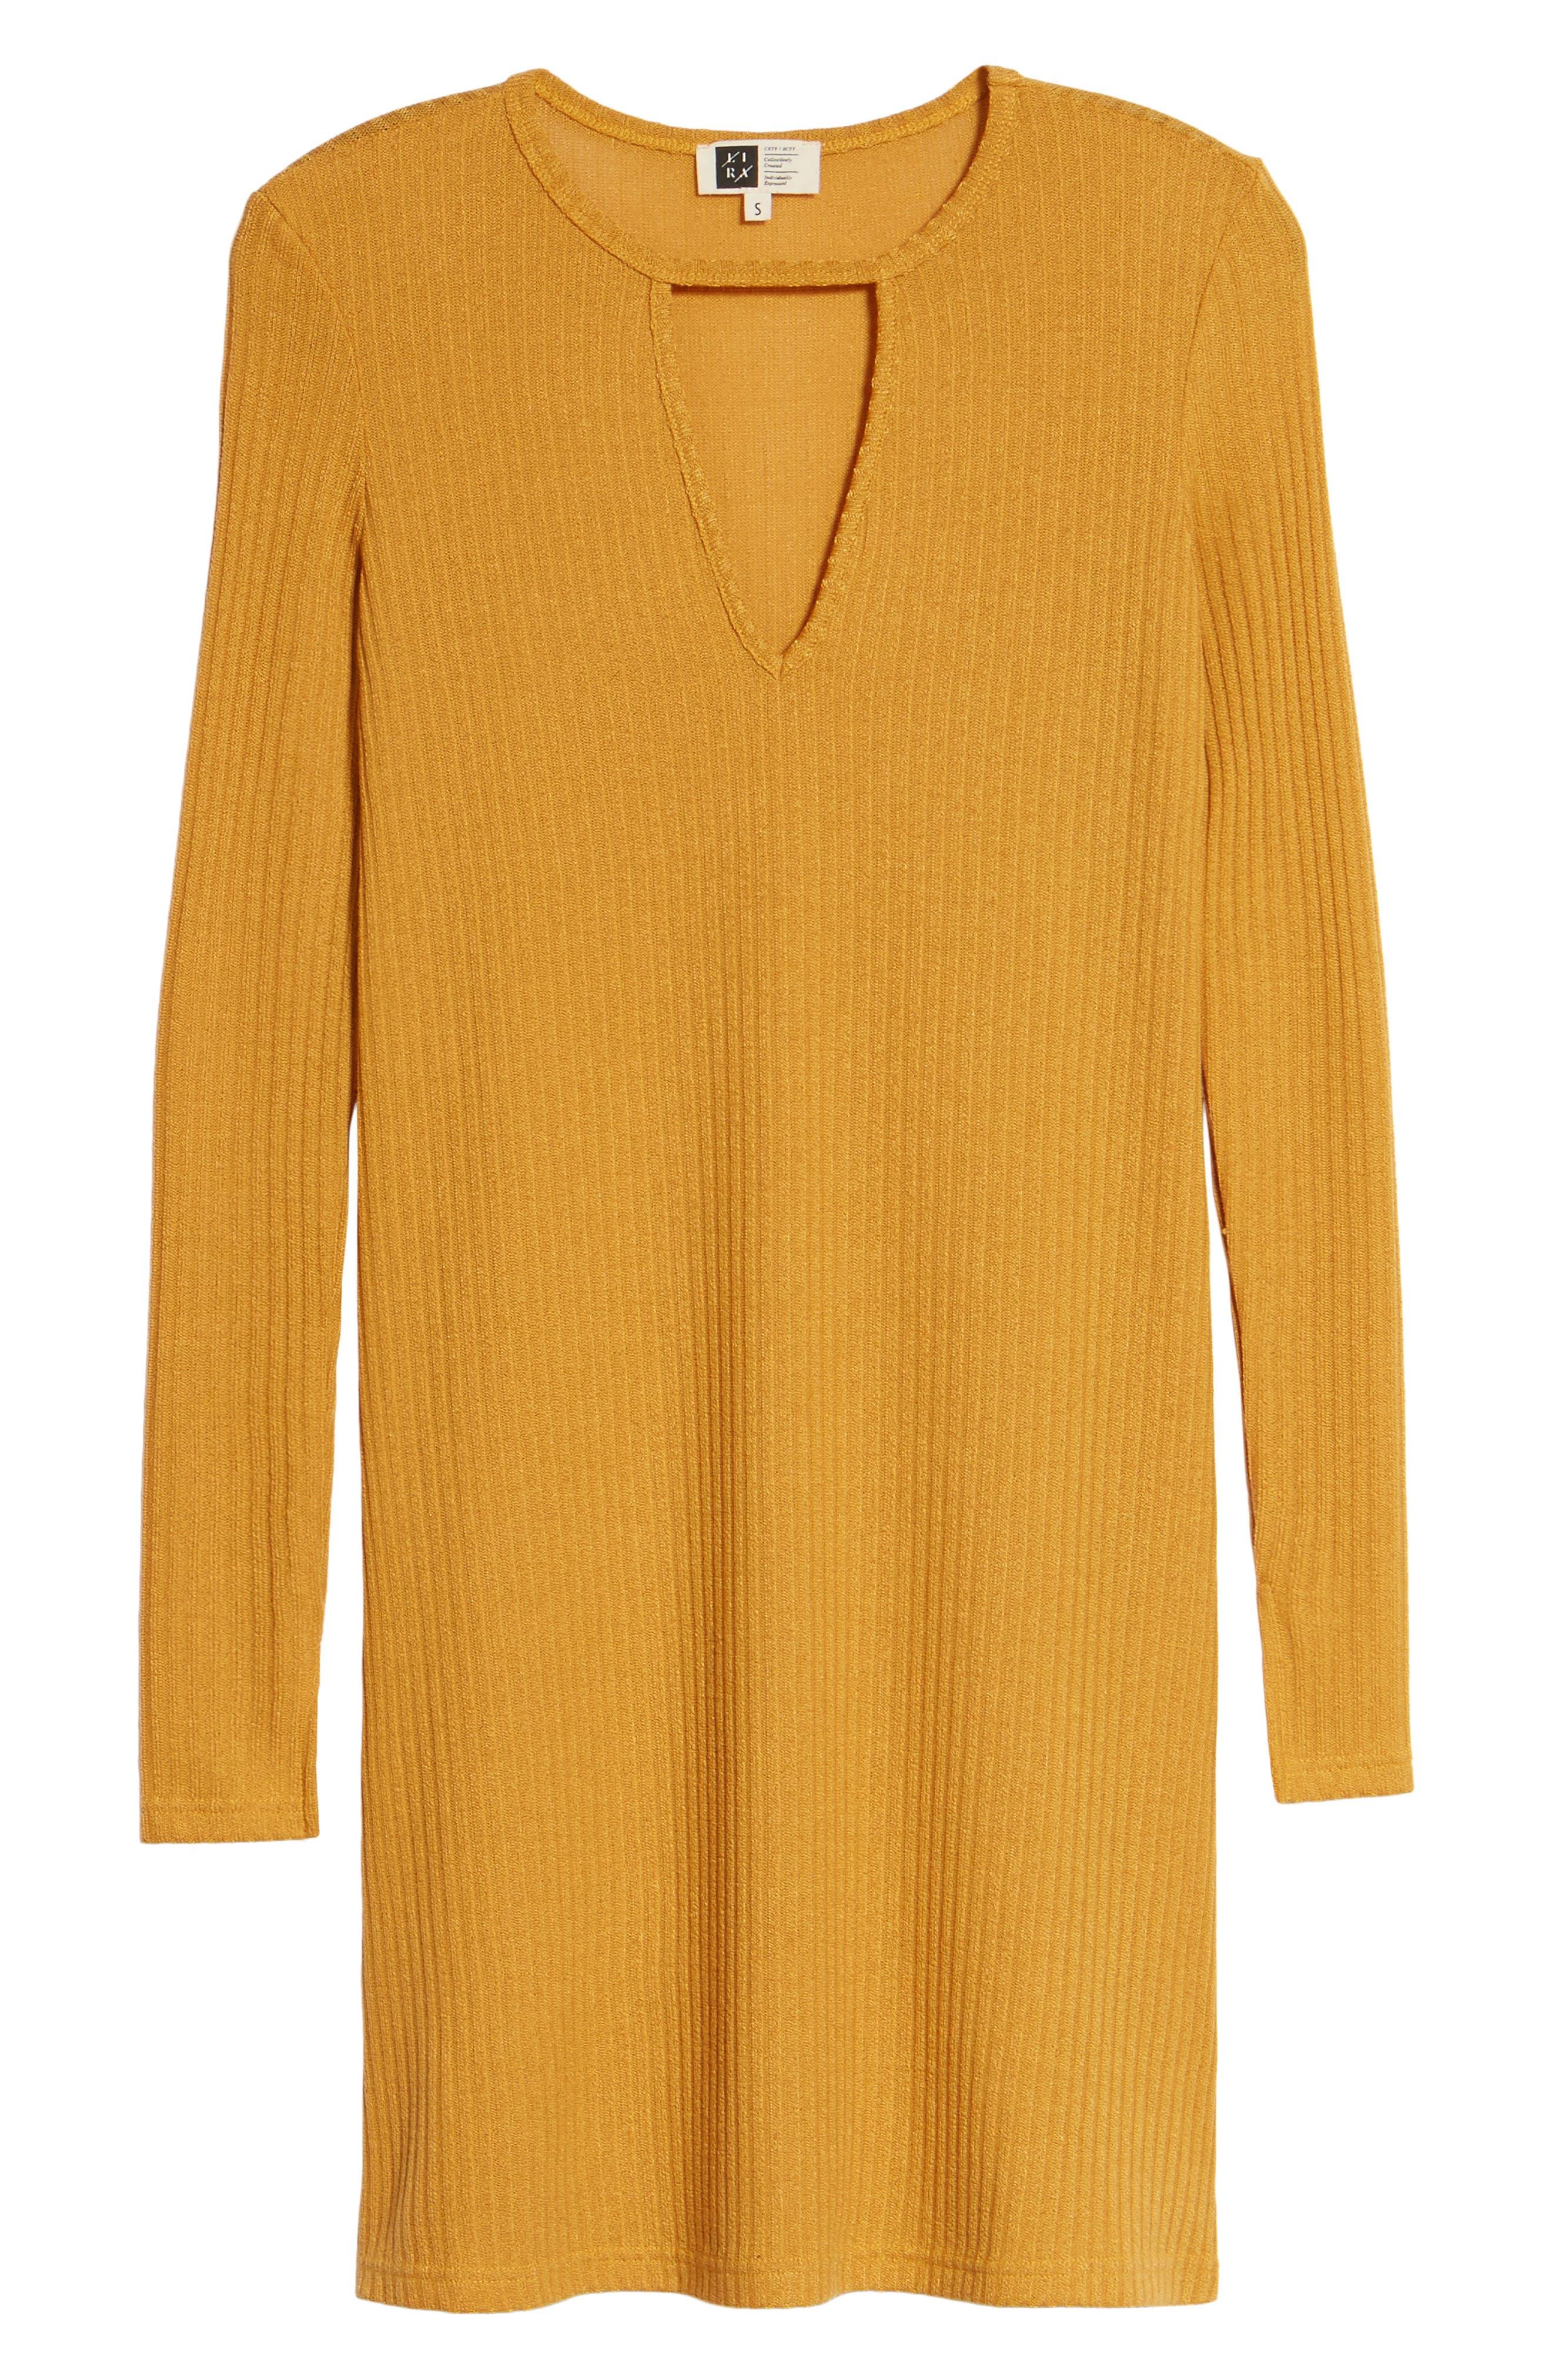 Maven Thermal Dress,                             Alternate thumbnail 6, color,                             Mustard